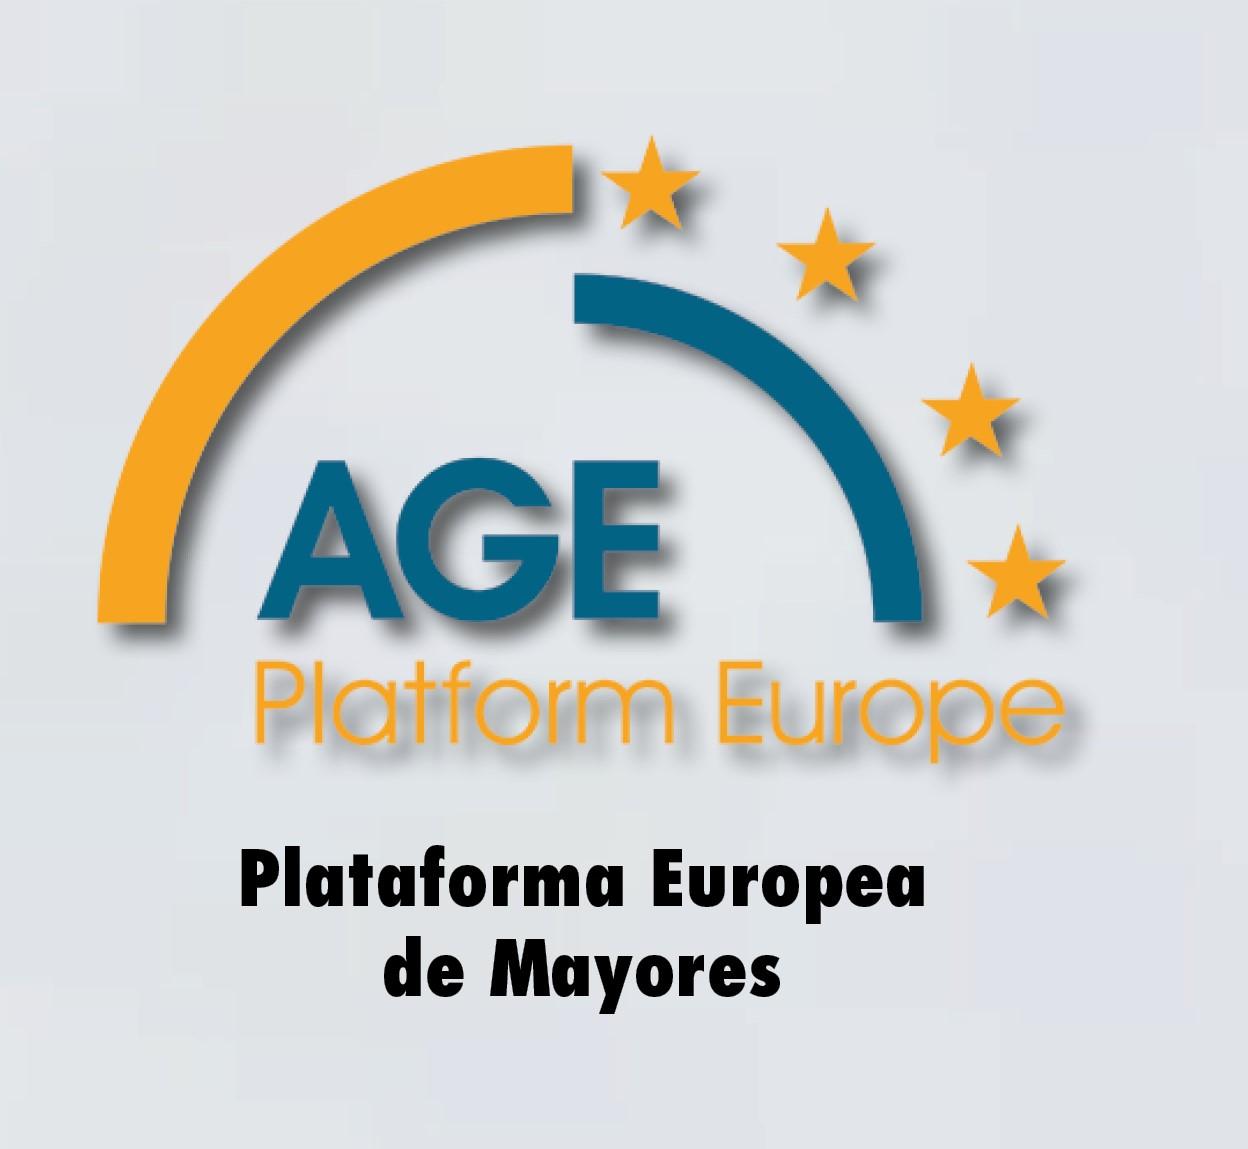 Plataforma Europea de Mayores